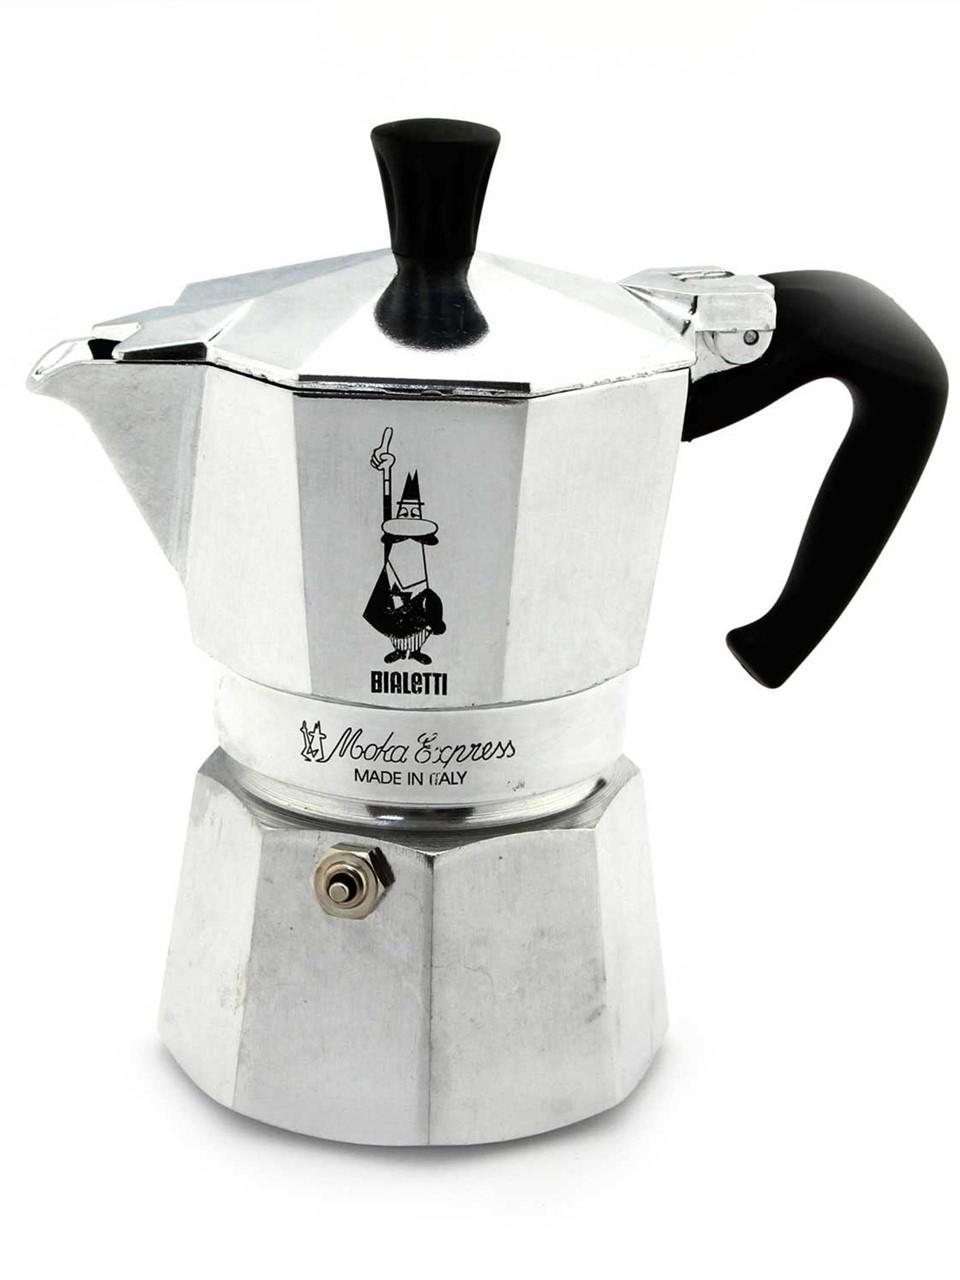 bialetti espressokocher moka express export 6 tassen. Black Bedroom Furniture Sets. Home Design Ideas